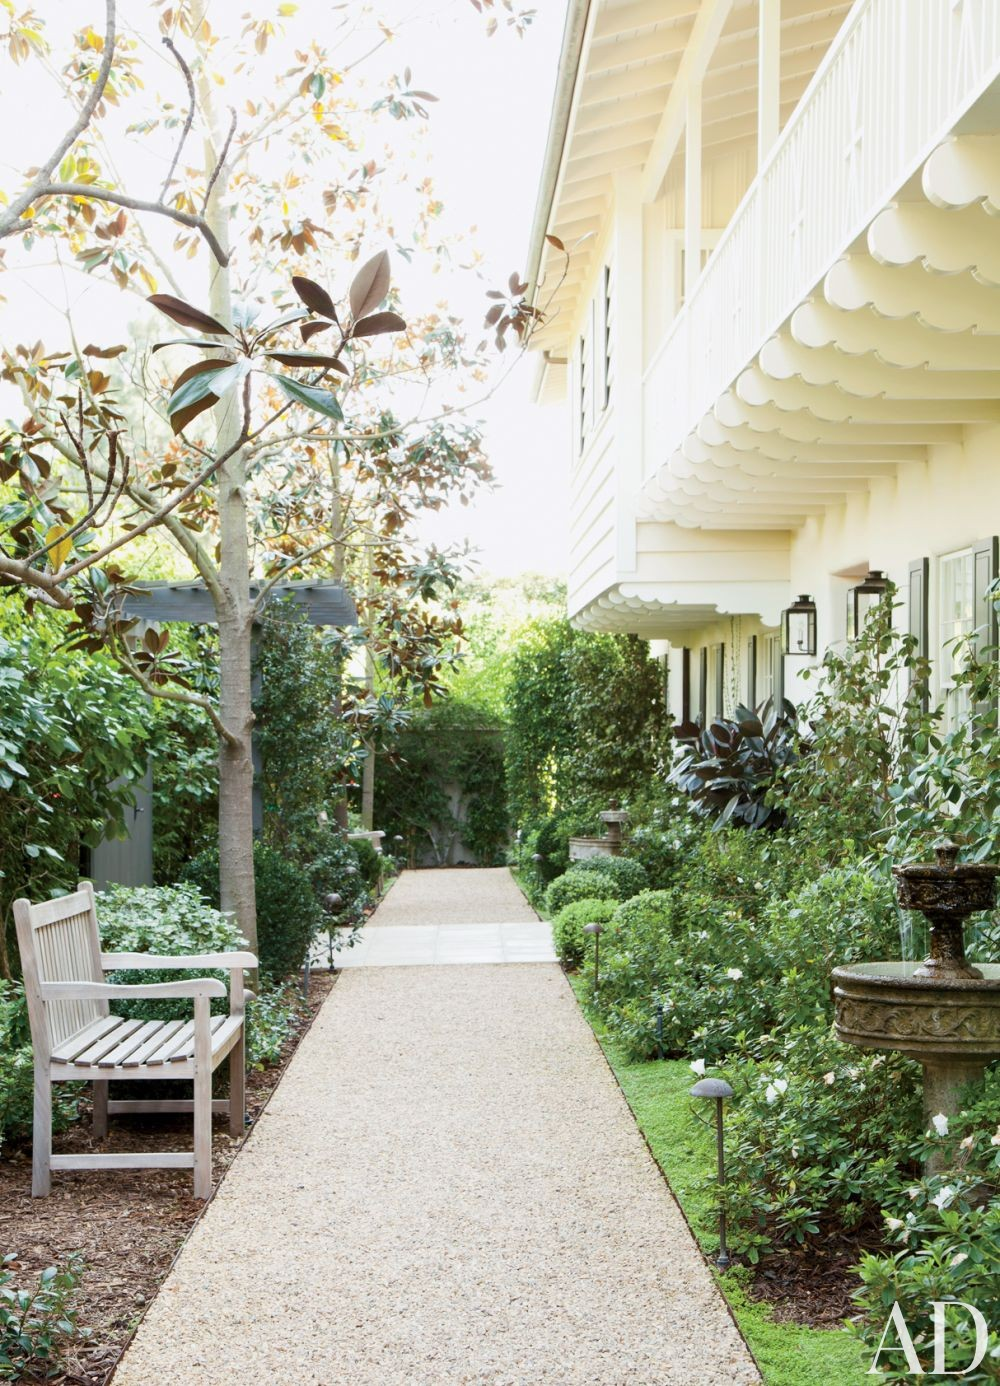 Traditional Garden by Trip Haenisch & Associates in Bel Air, California